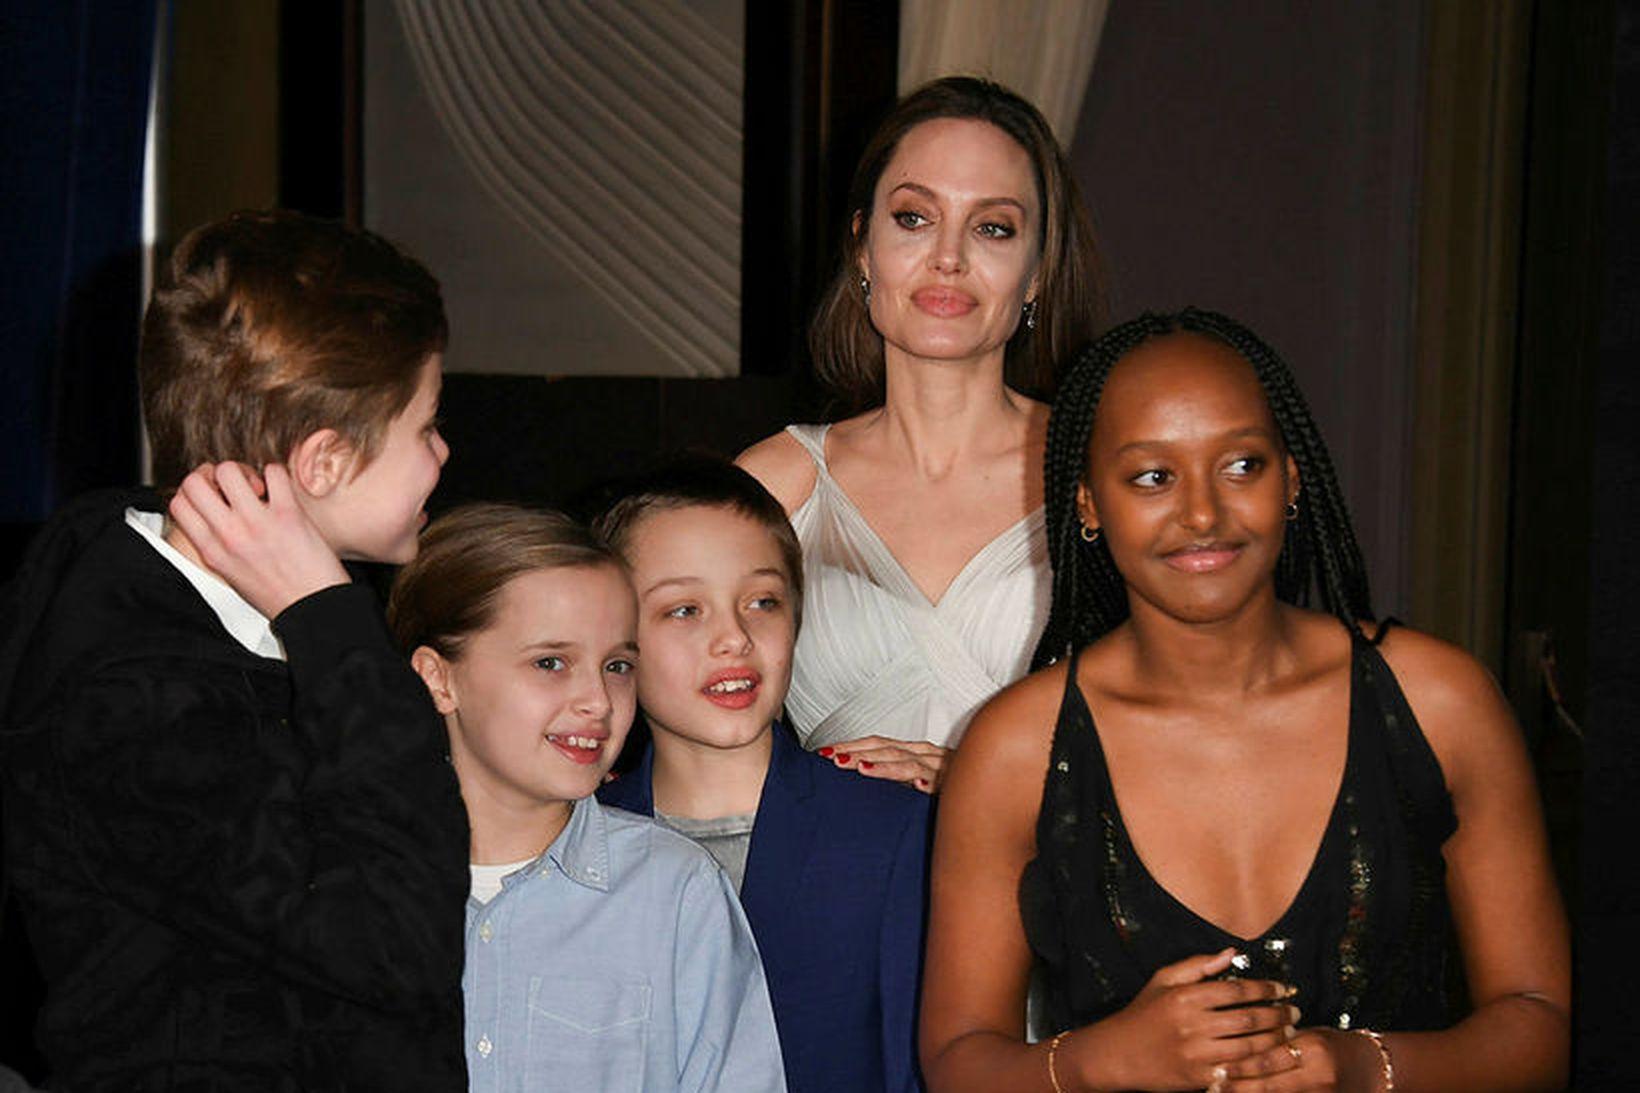 Angelina Jolie með börnum sínum Shiloh Jolie-Pitt, Vivienne Marcheline Jolie-Pitt, …